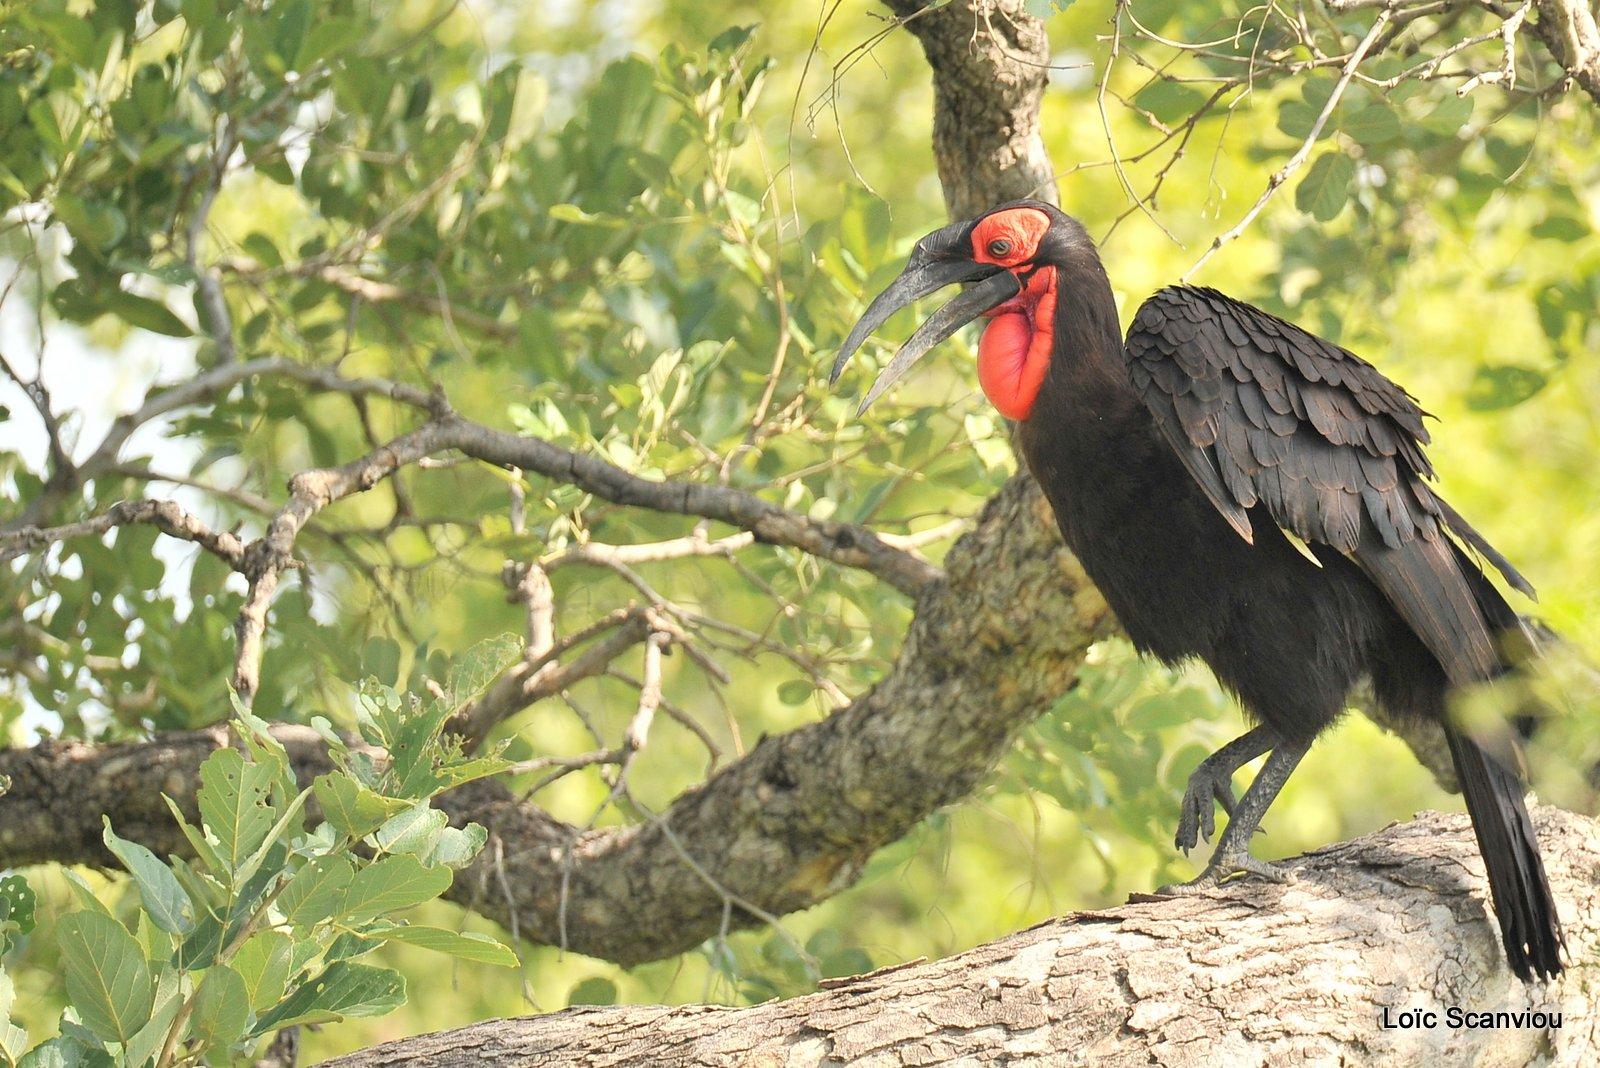 Bucorve du Sud/Southern Ground Hornbill (1)